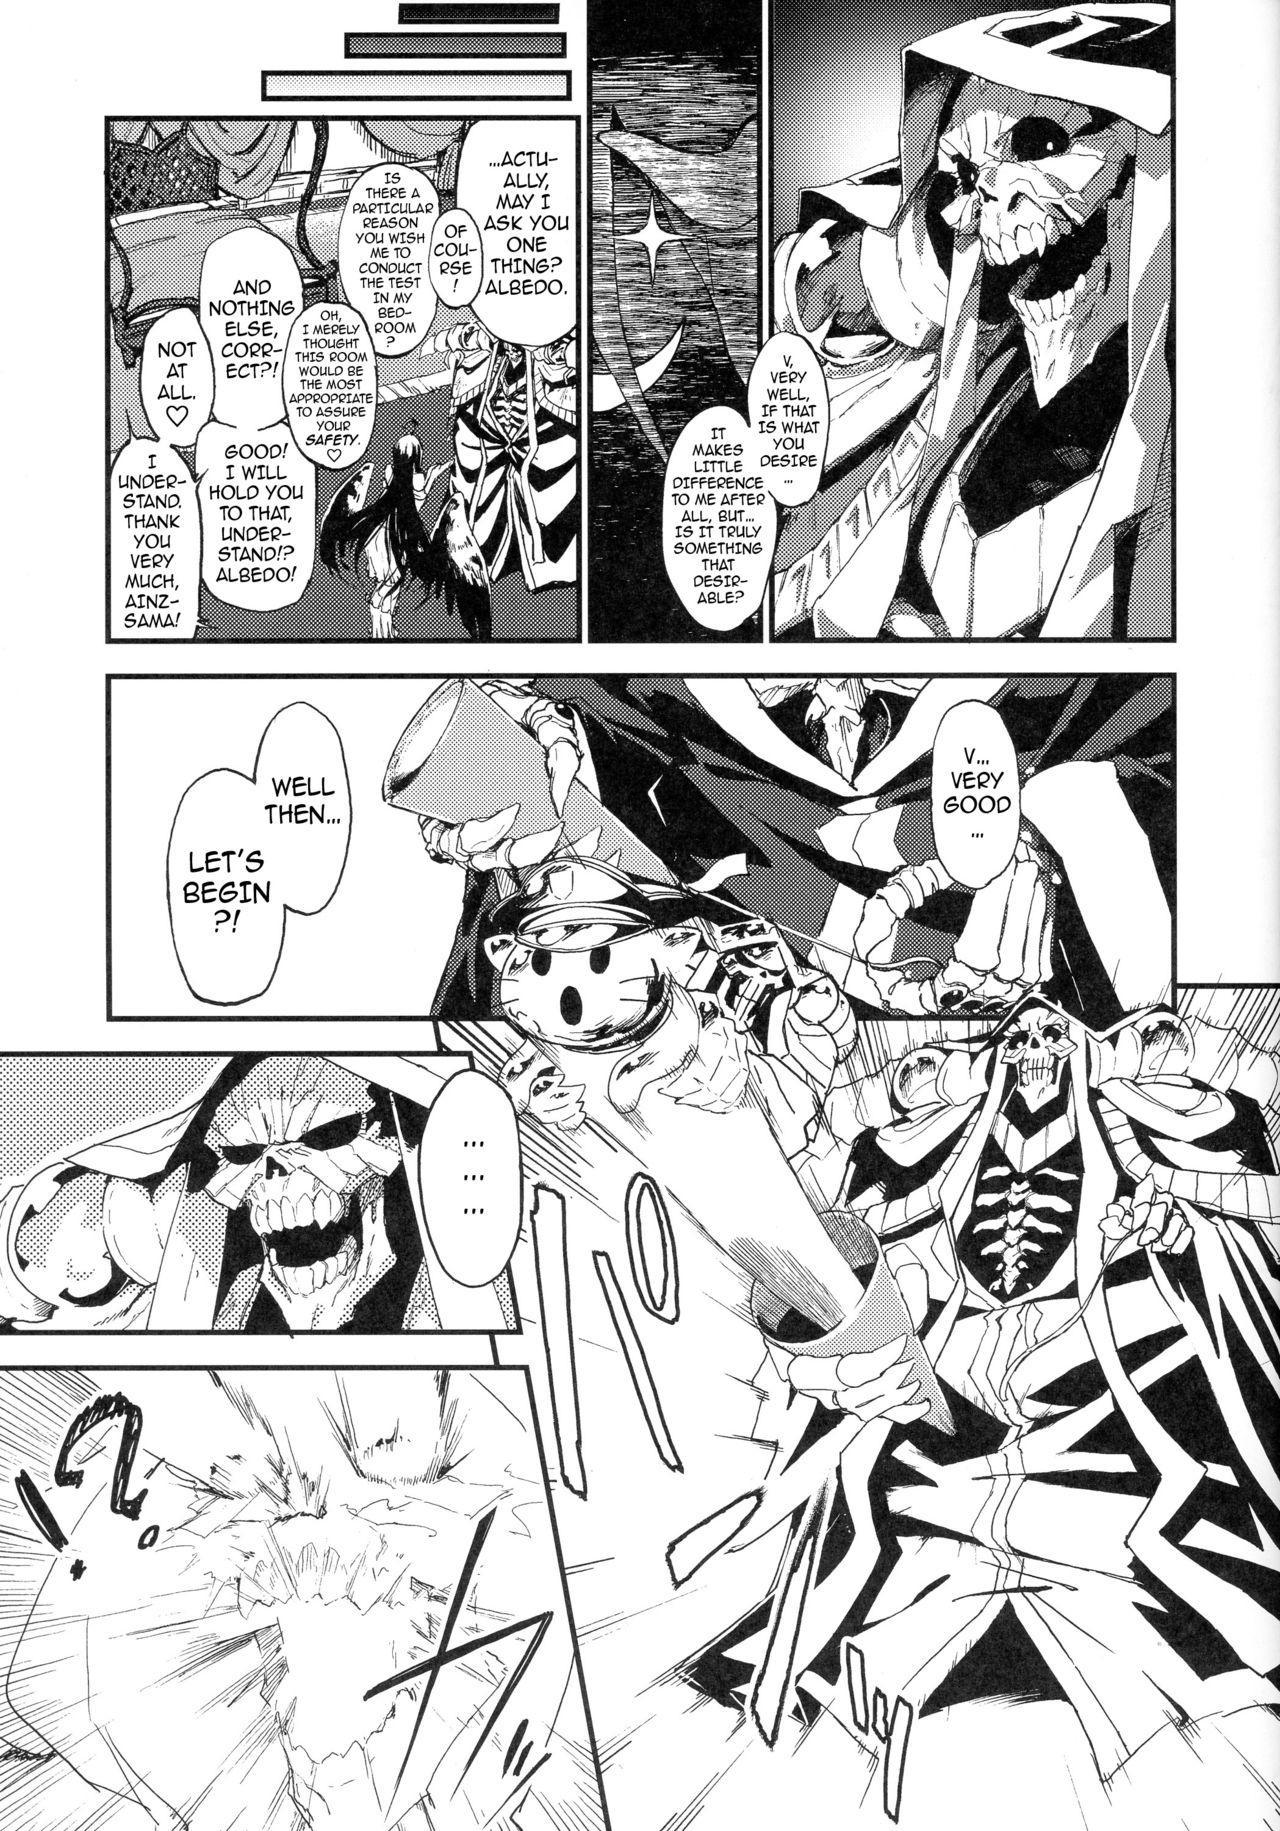 (COMIC1☆13) [Sekigaiken (Komagata)] Ainz-sama no Oyotsugi o! | Ainz-sama, Leave Your Heir to! (Overlord) [English] {darknight} 5